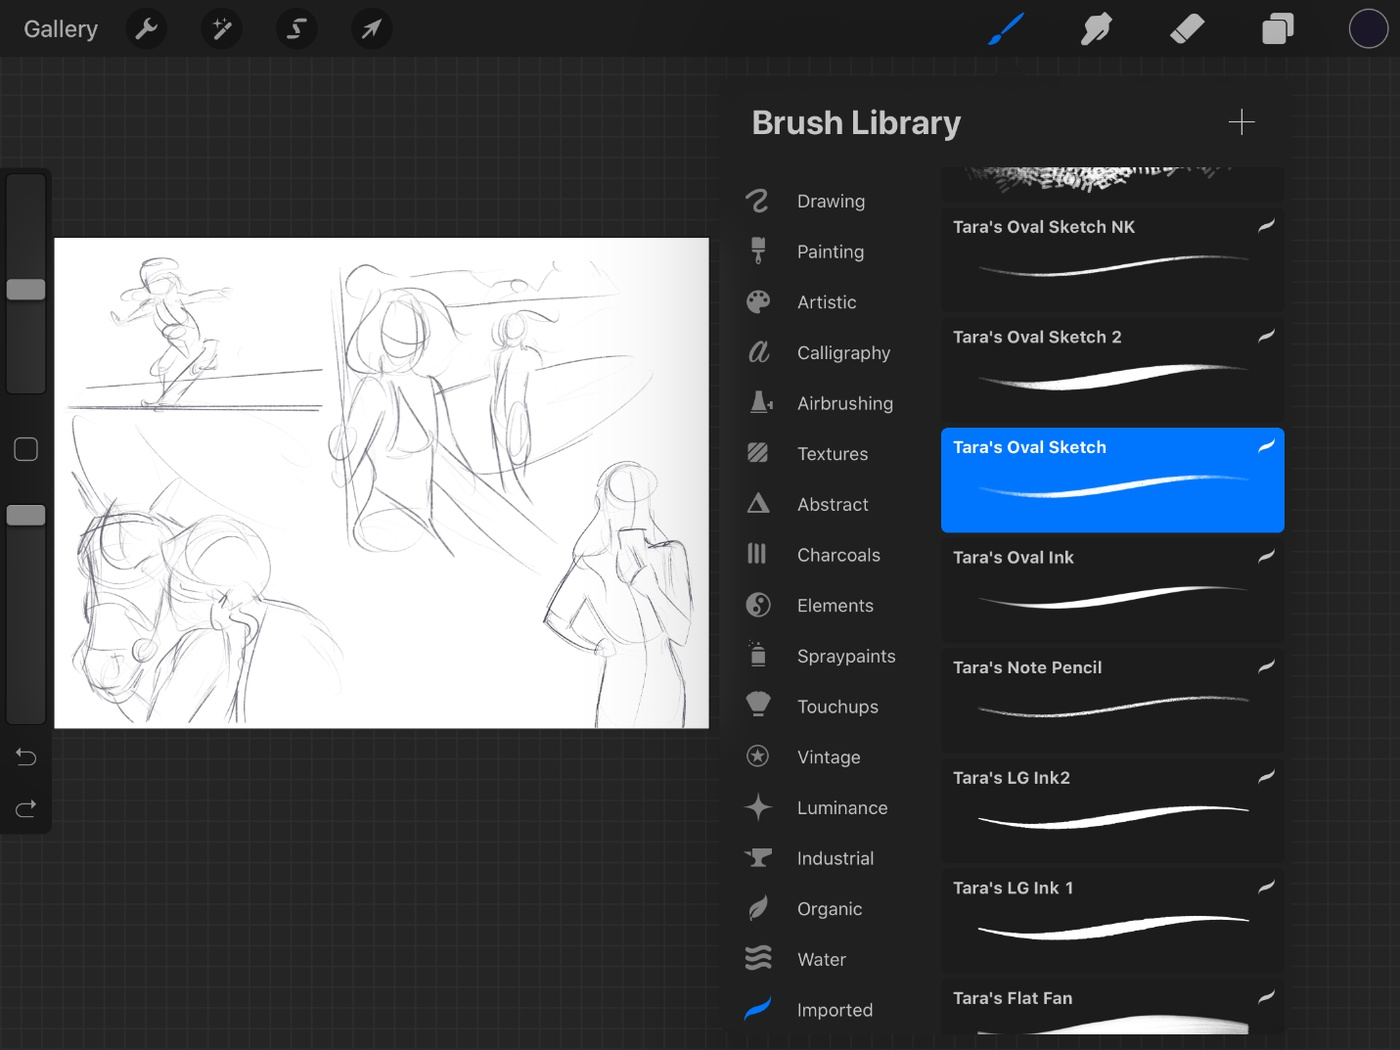 brush library gallery procreate design illustration tip